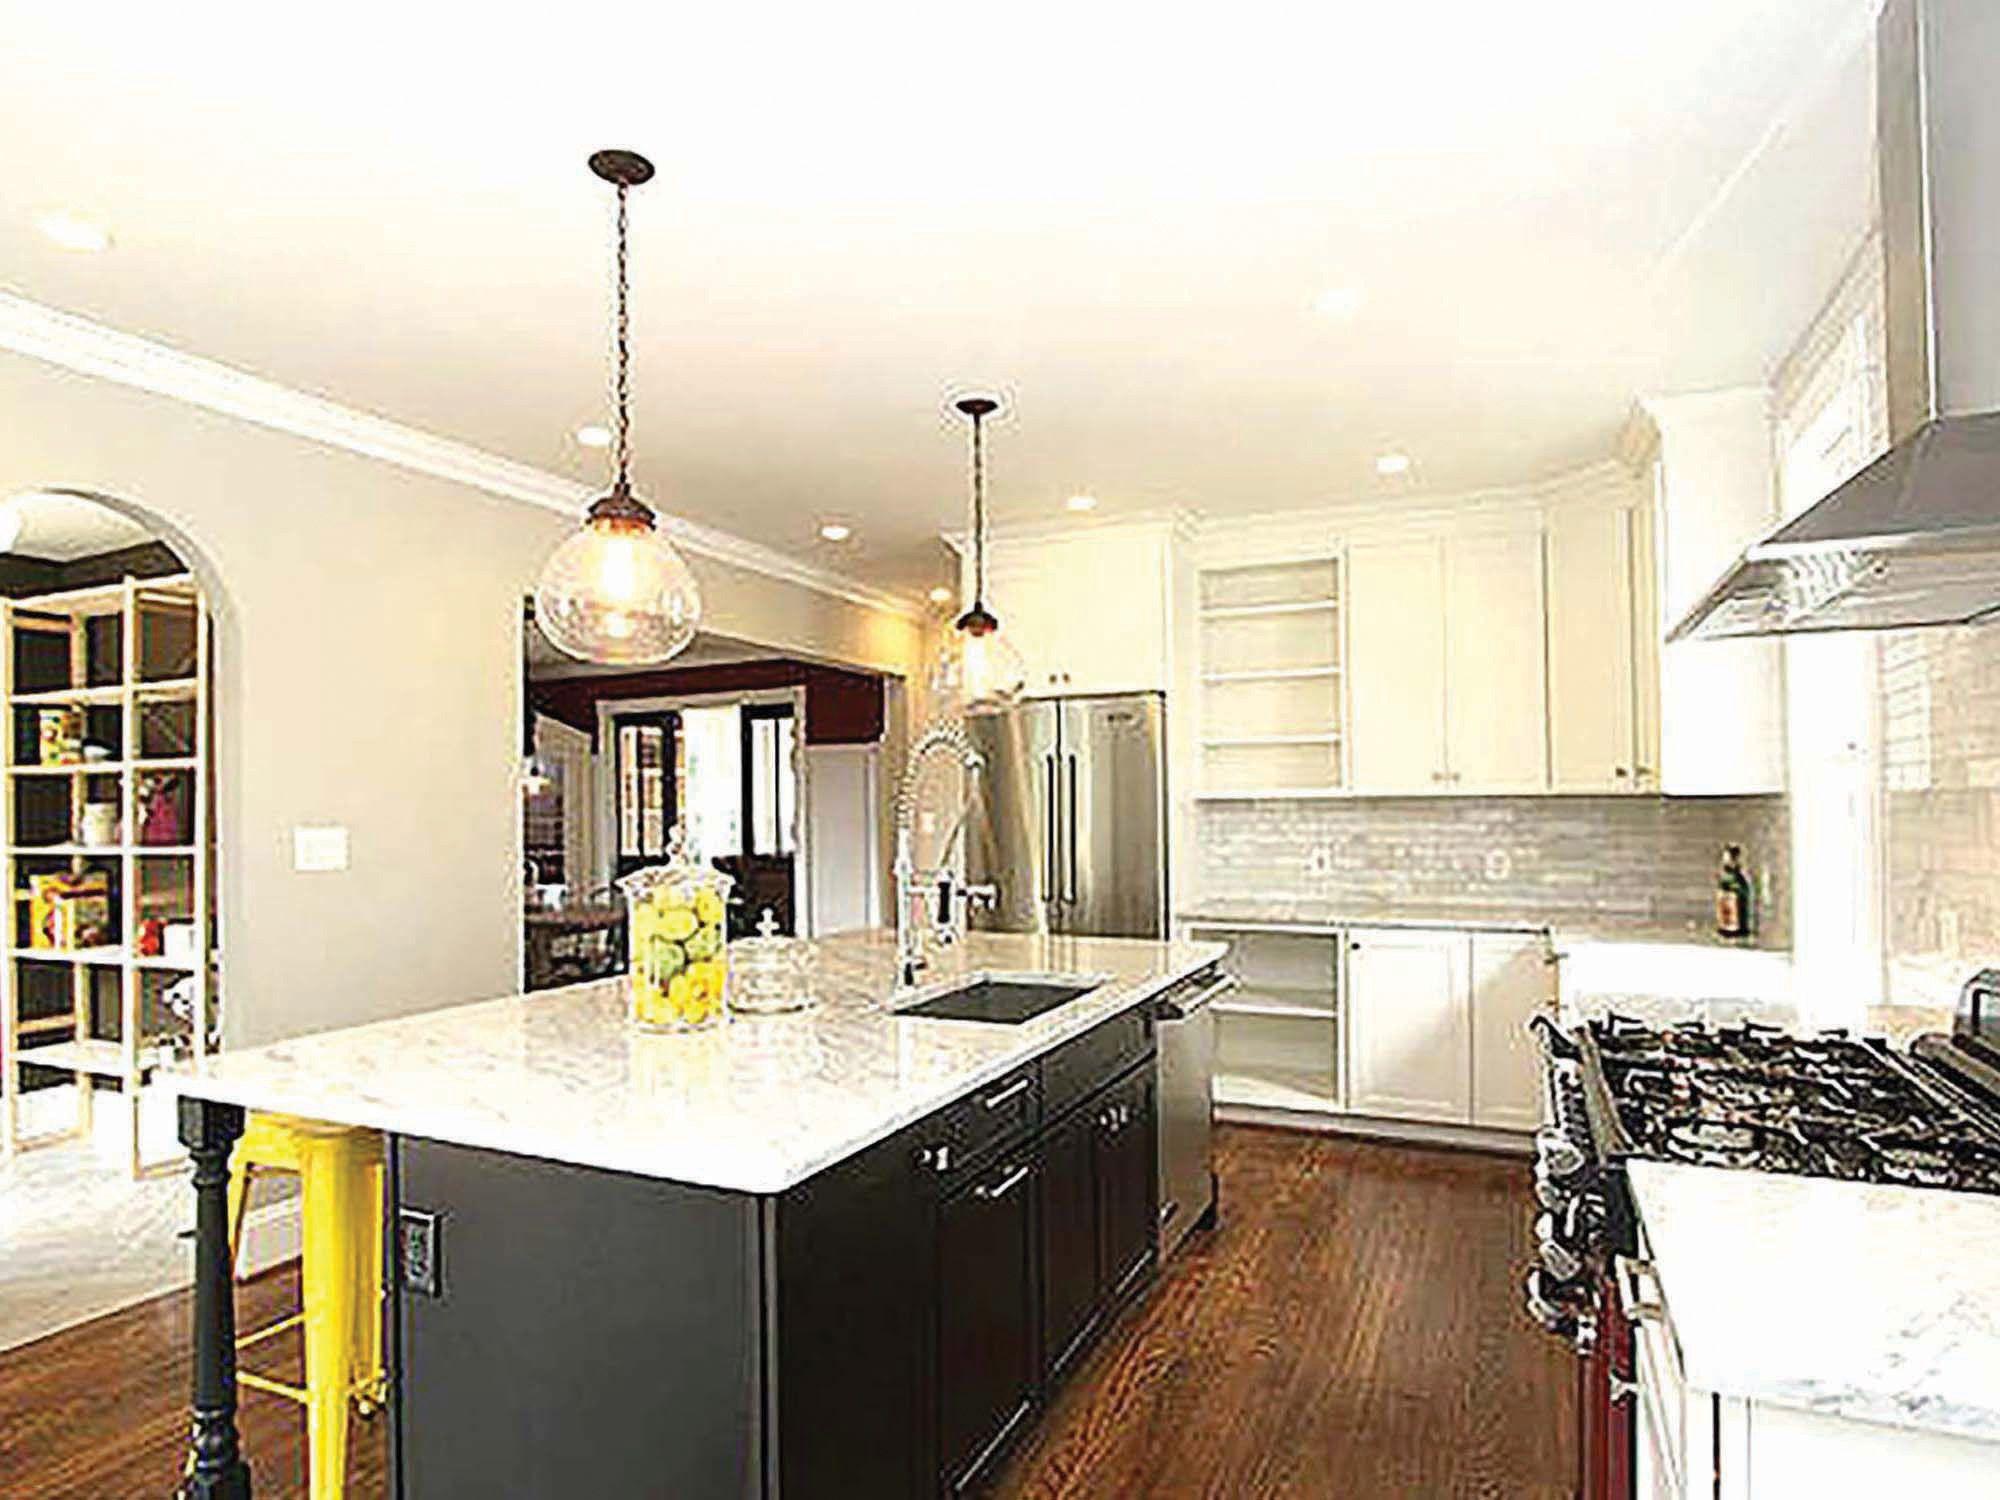 Rockville Maryland Kitchen Renovation Features Cliqstudios Dayton Simple Dayton Bathroom Remodeling Decorating Inspiration